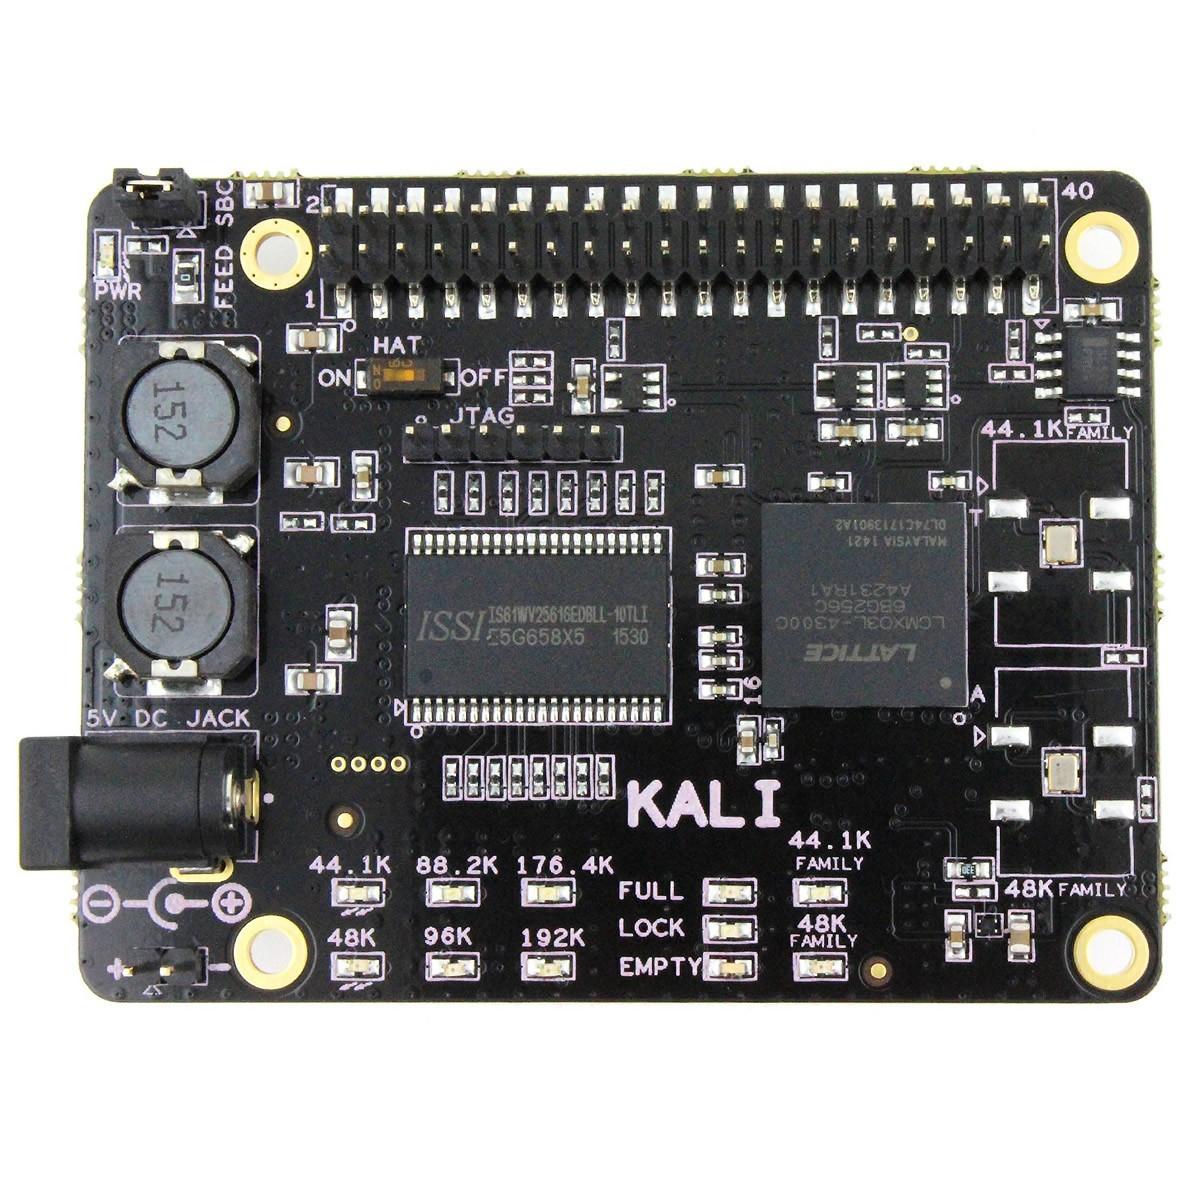 ALLO KALI Reclocker I2S FIFO Sparky SBC et Raspberry Pi 22/24MHz 192kHZ